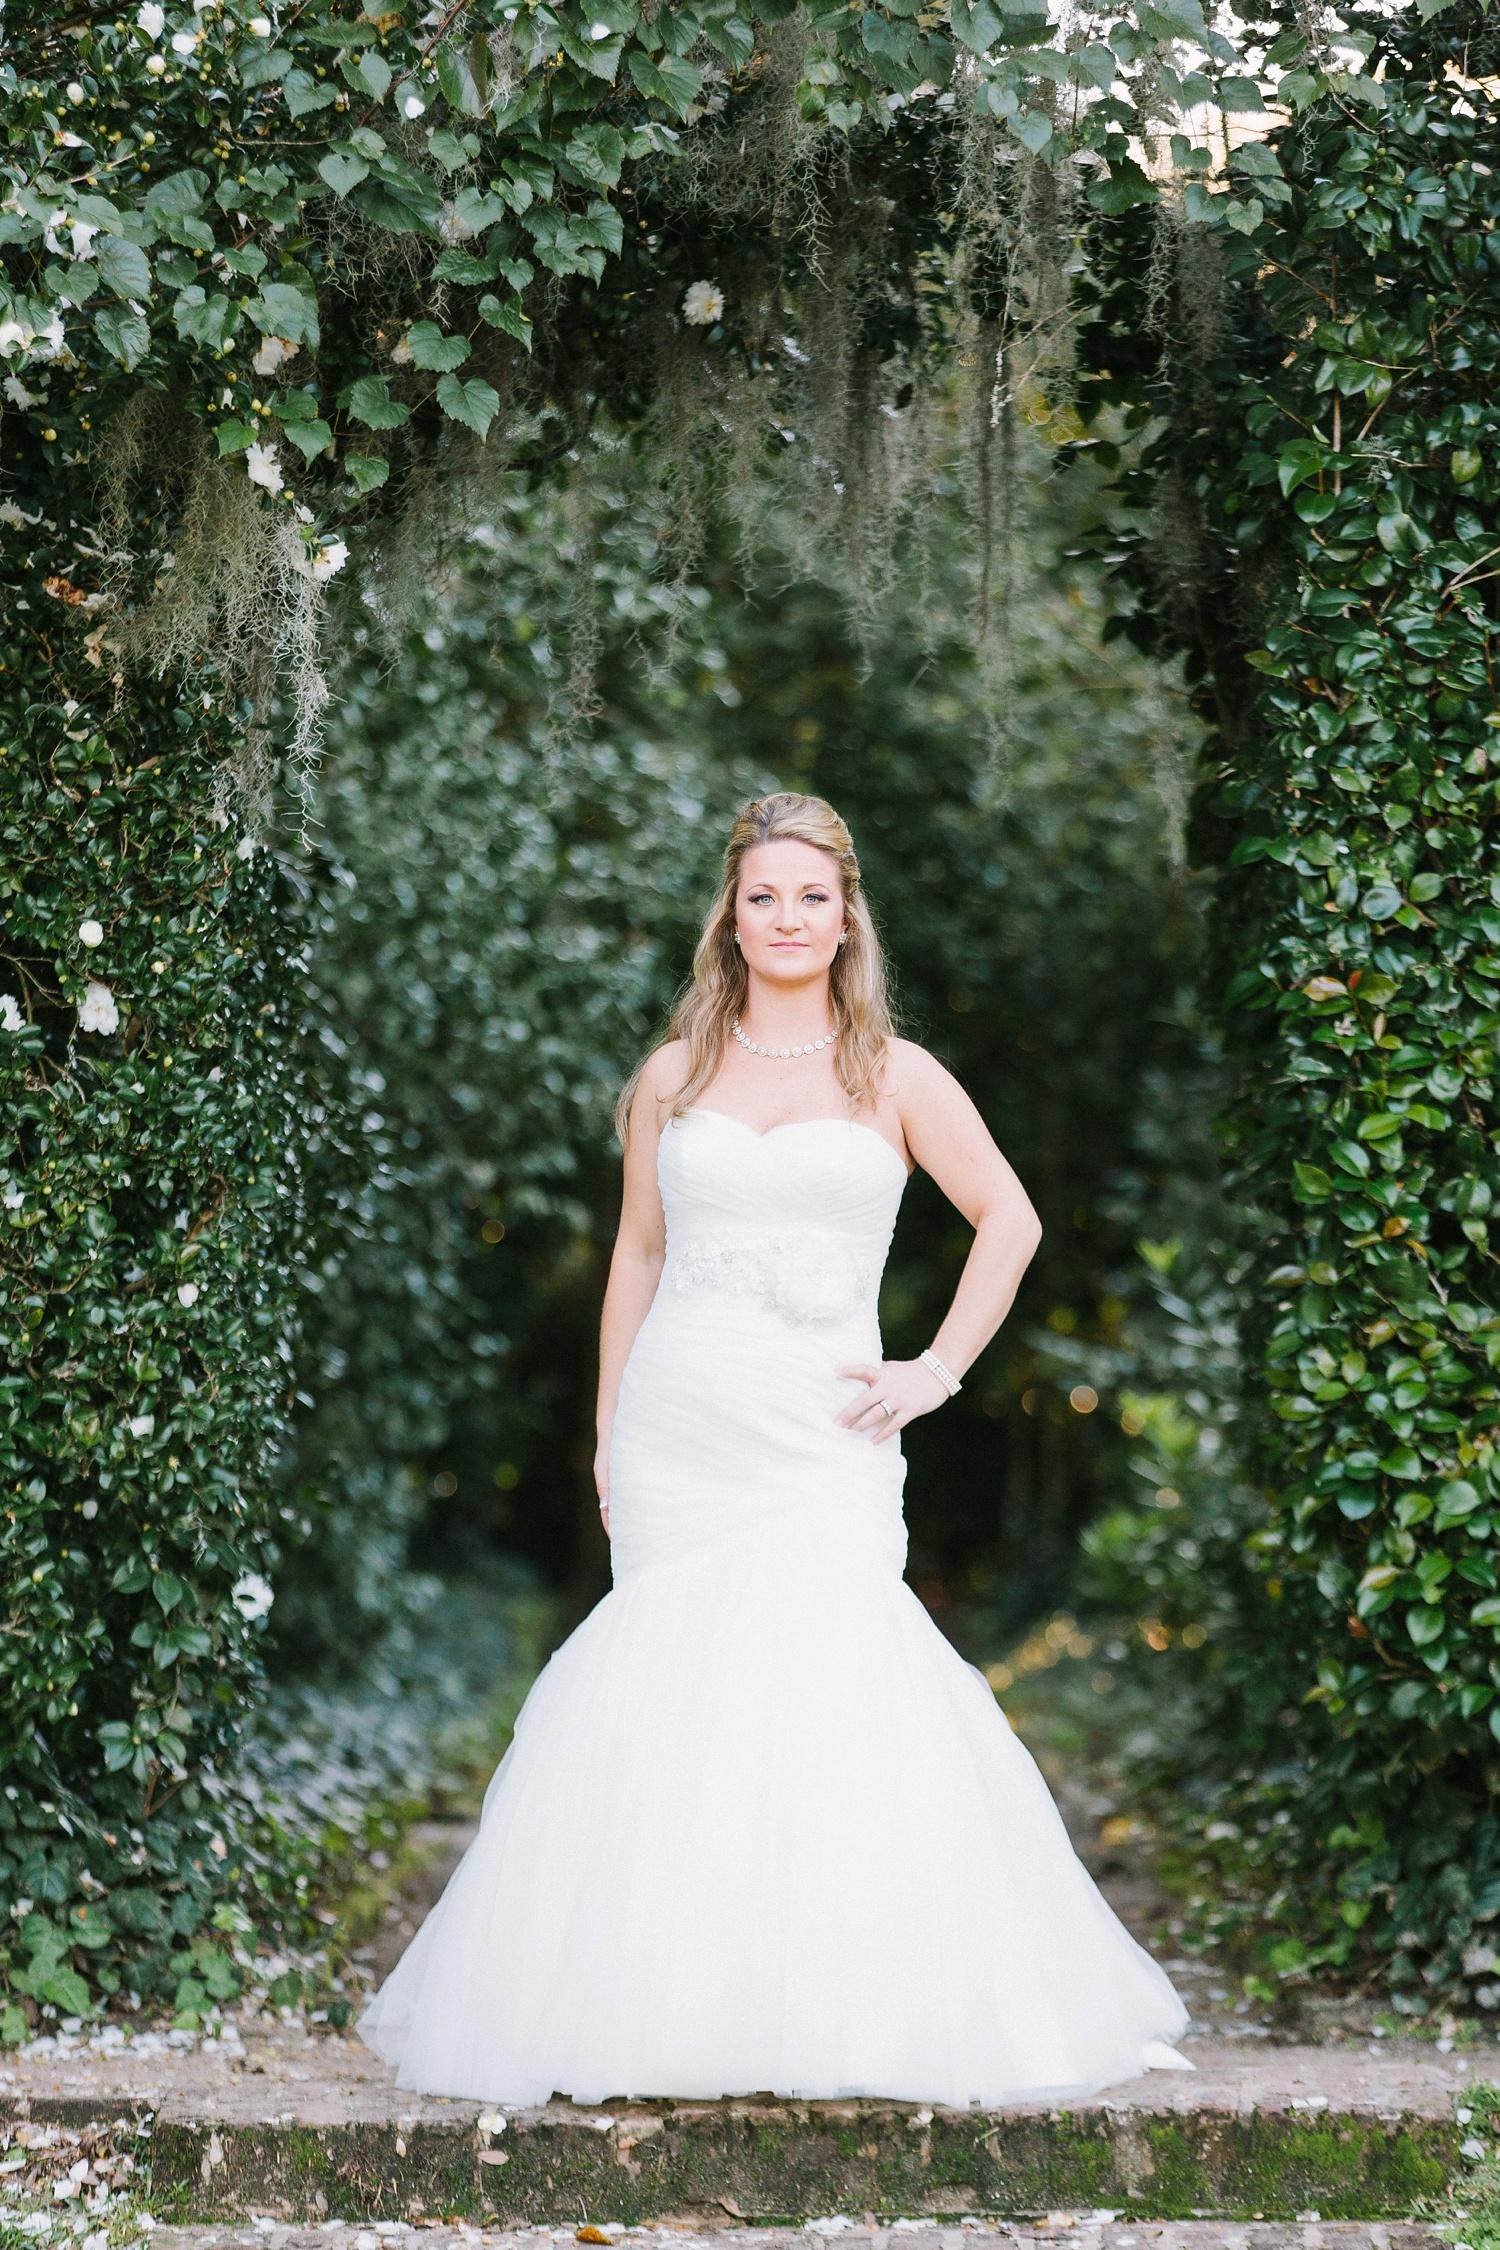 Lindsey_A_Miller_photography_bridal_portrait_middleton_plantation_charleston_sunset_spanish_moss_004.jpg